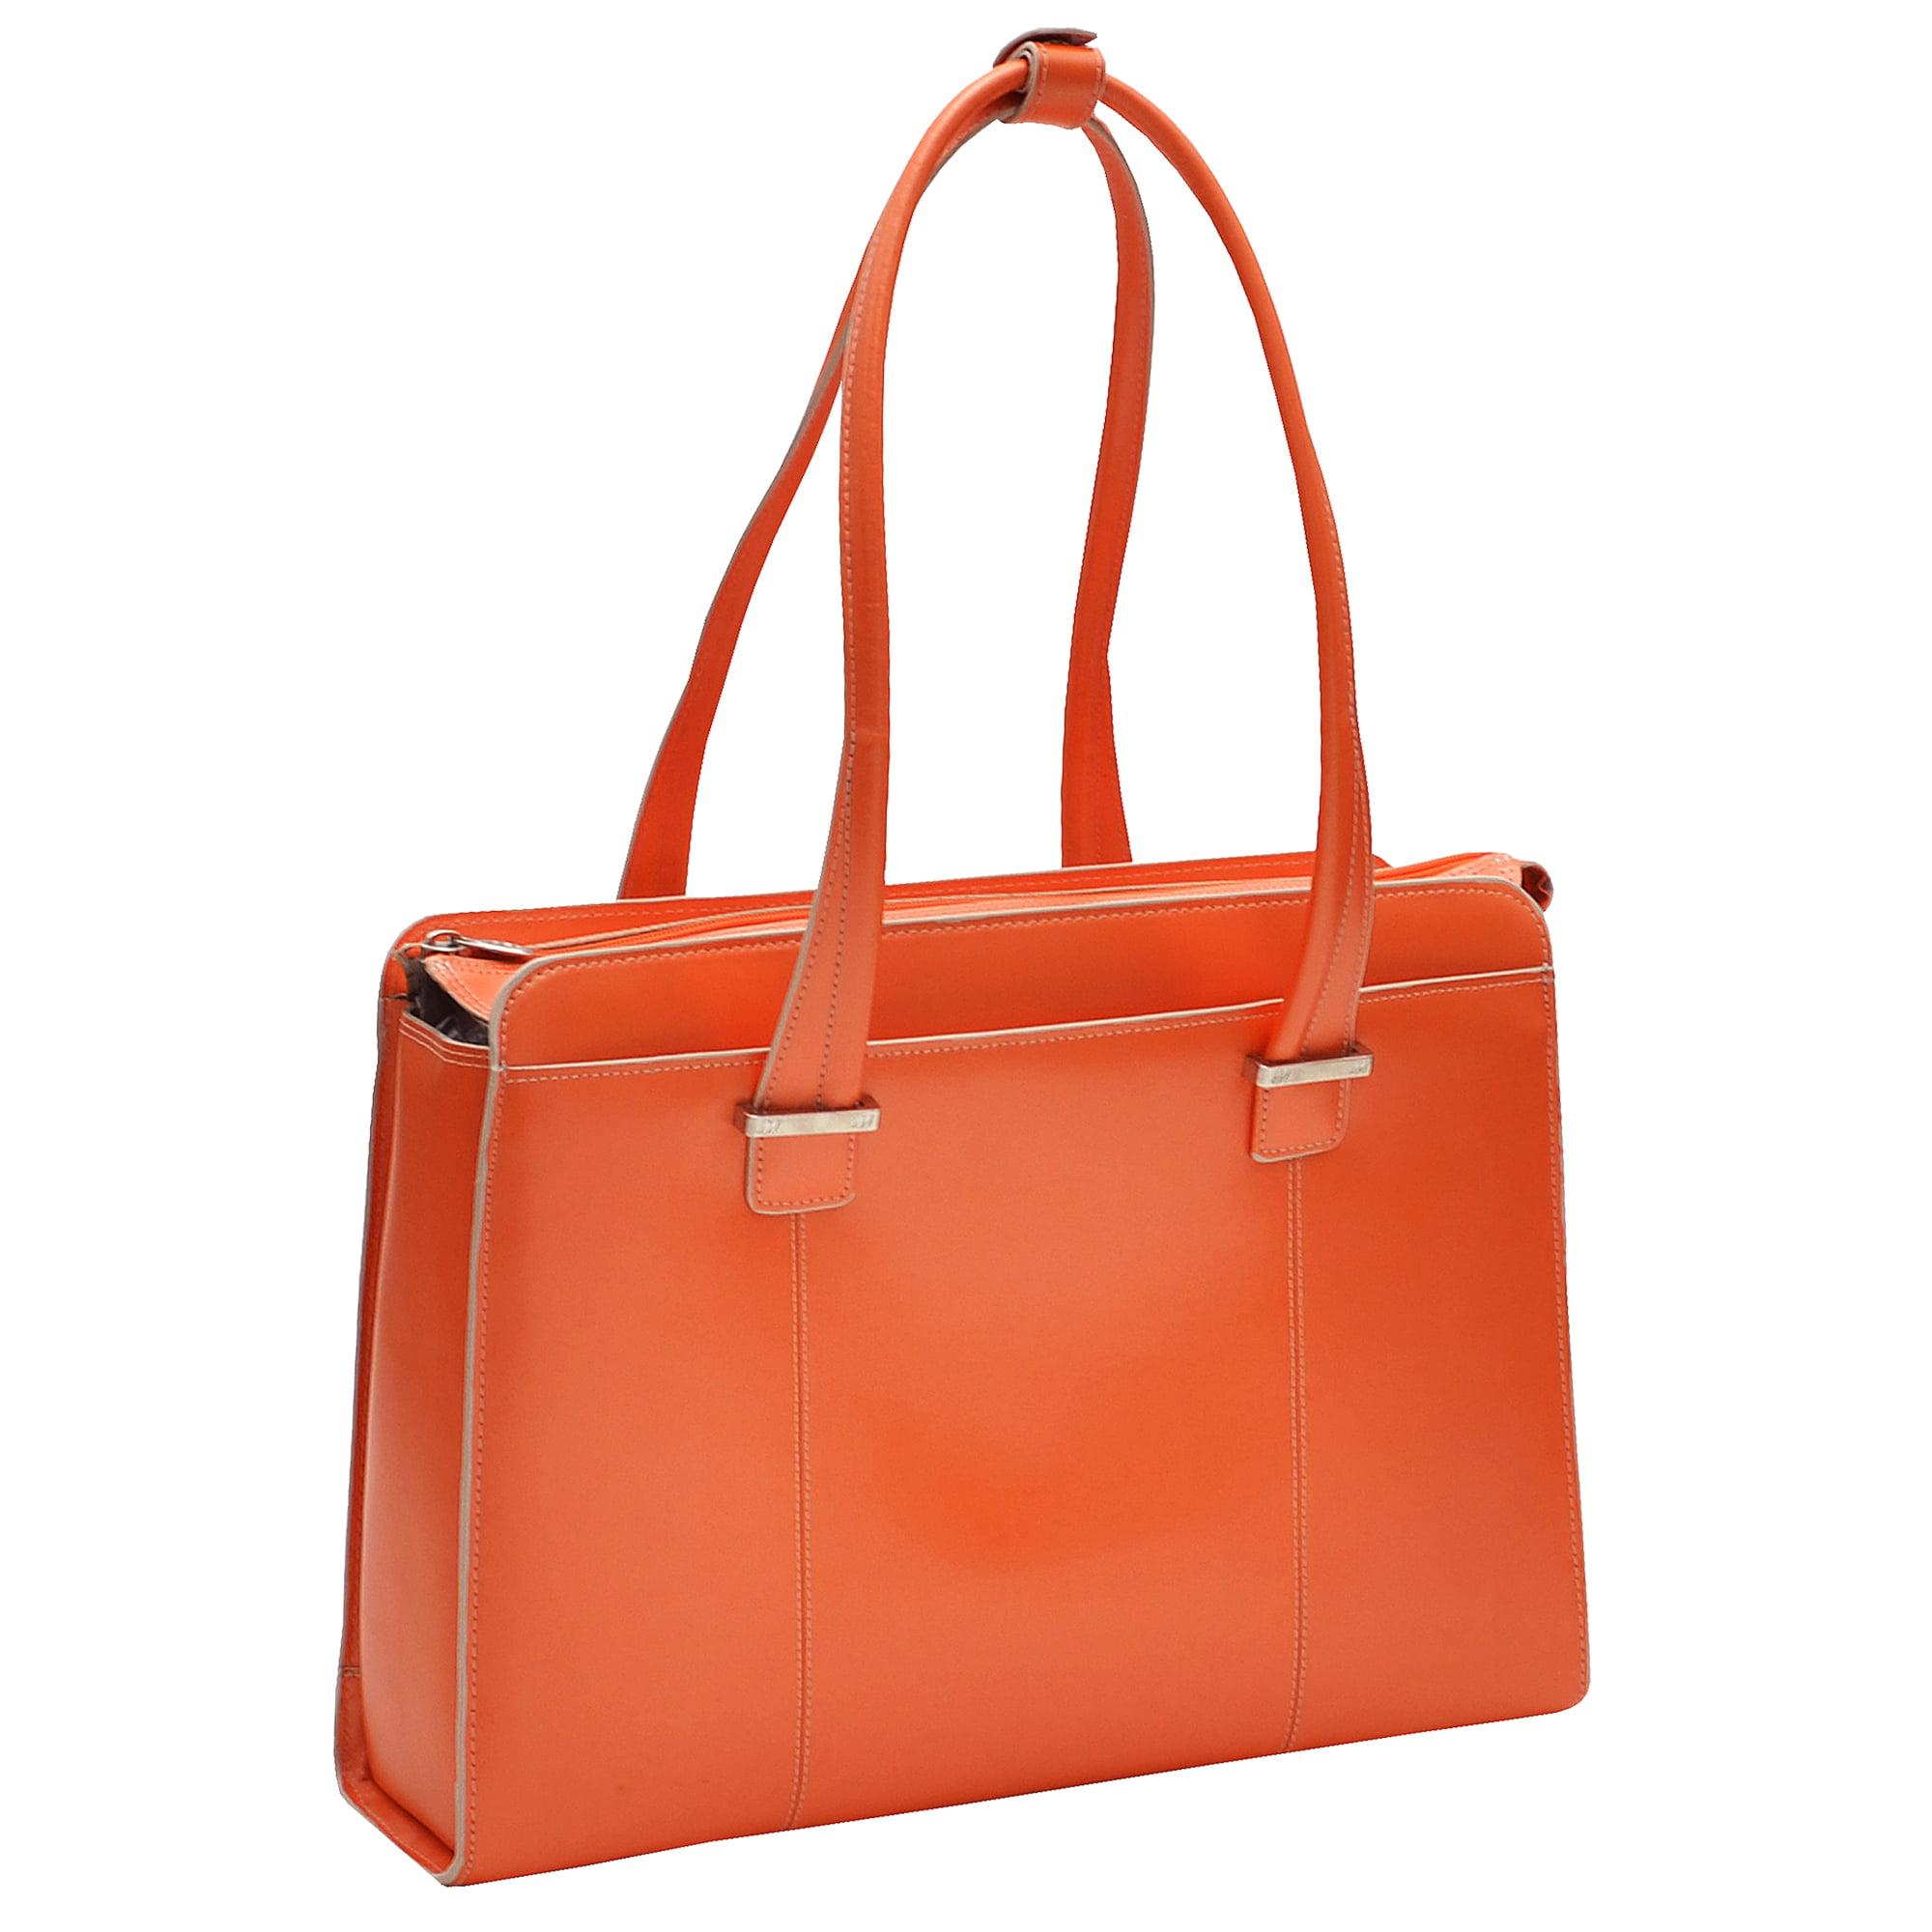 McKlein 96540 ALEXIS Leather Ladies Briefcase- Orange - image 1 of 4